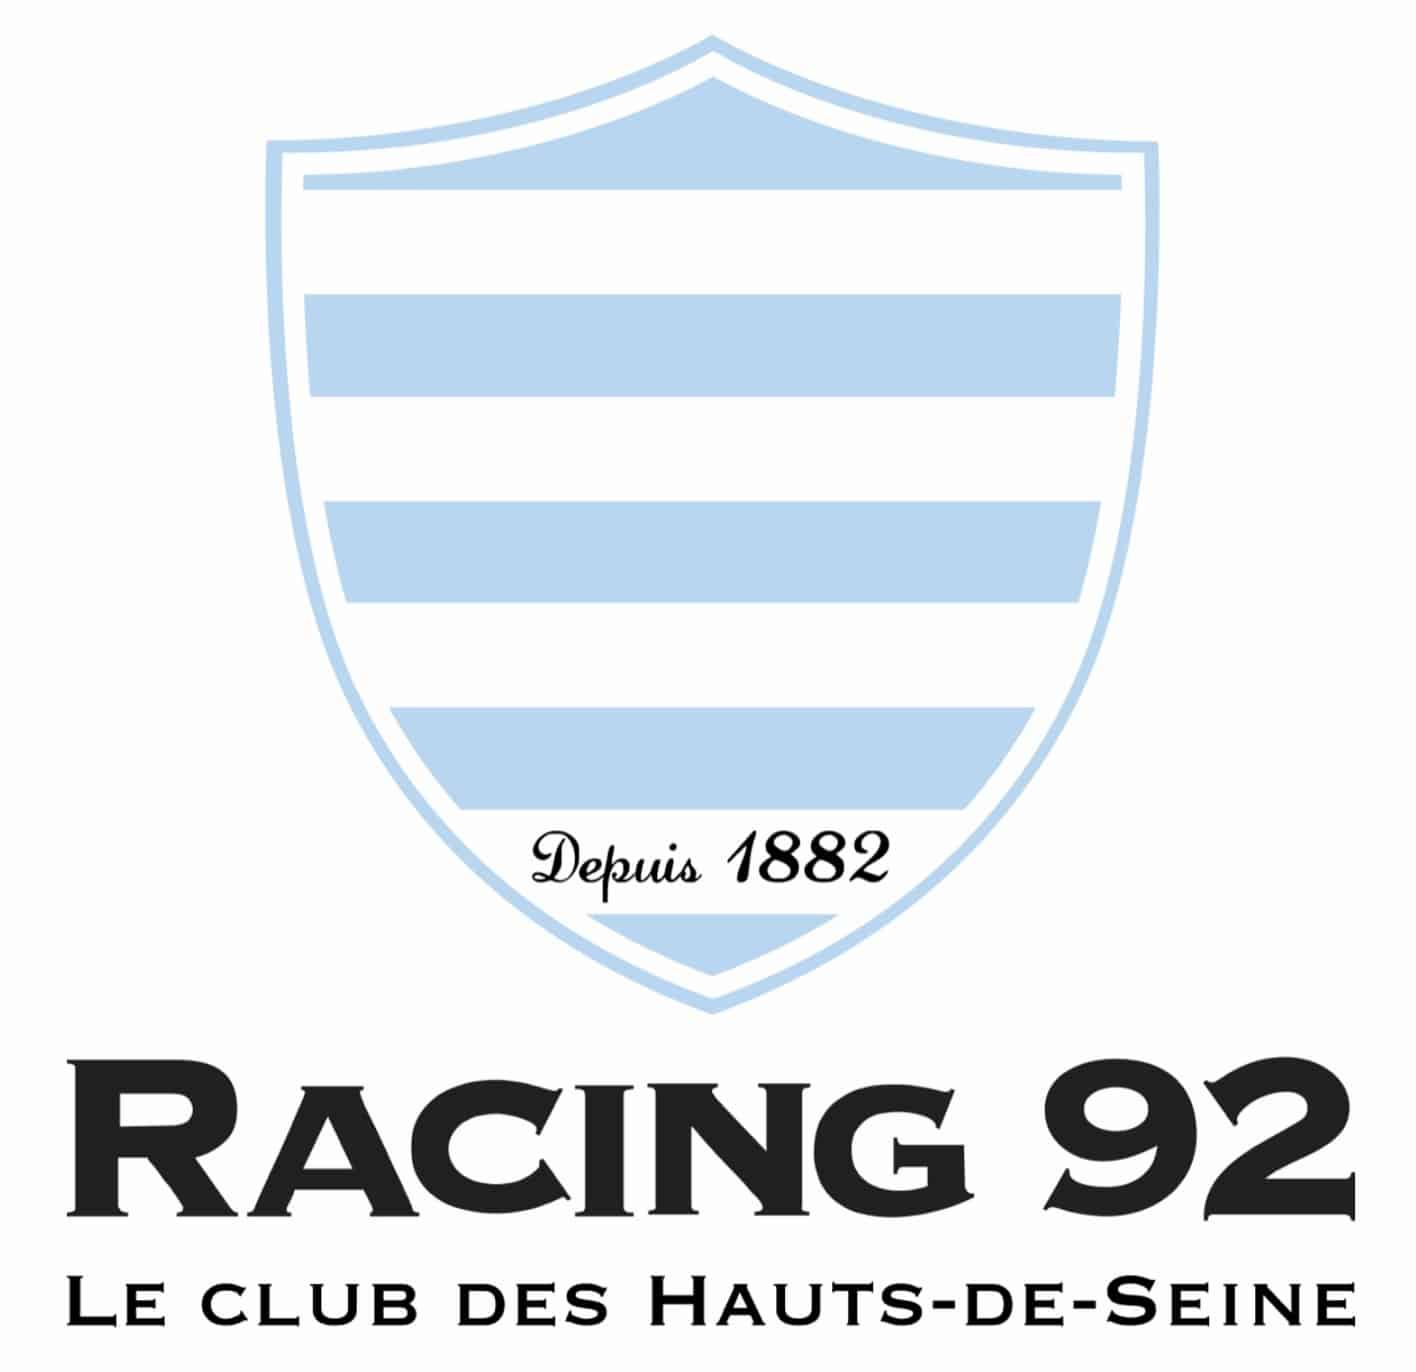 Club Rugby Racing 92